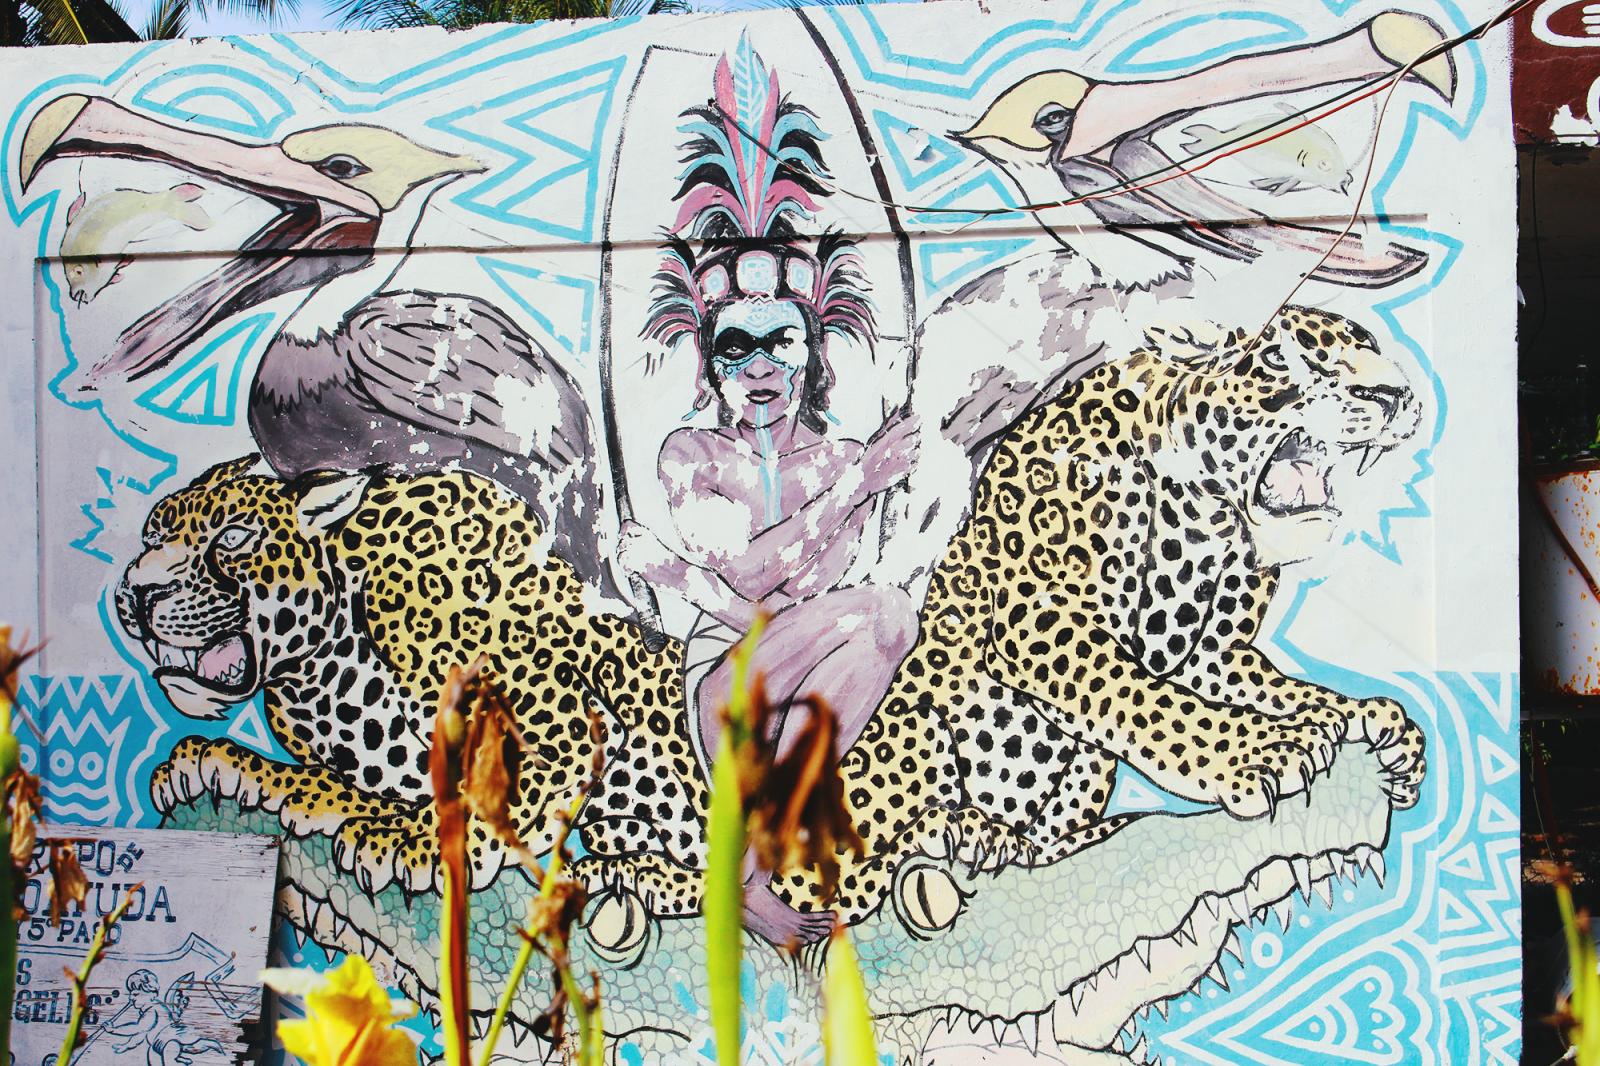 holbox street art mexico beach paradise island